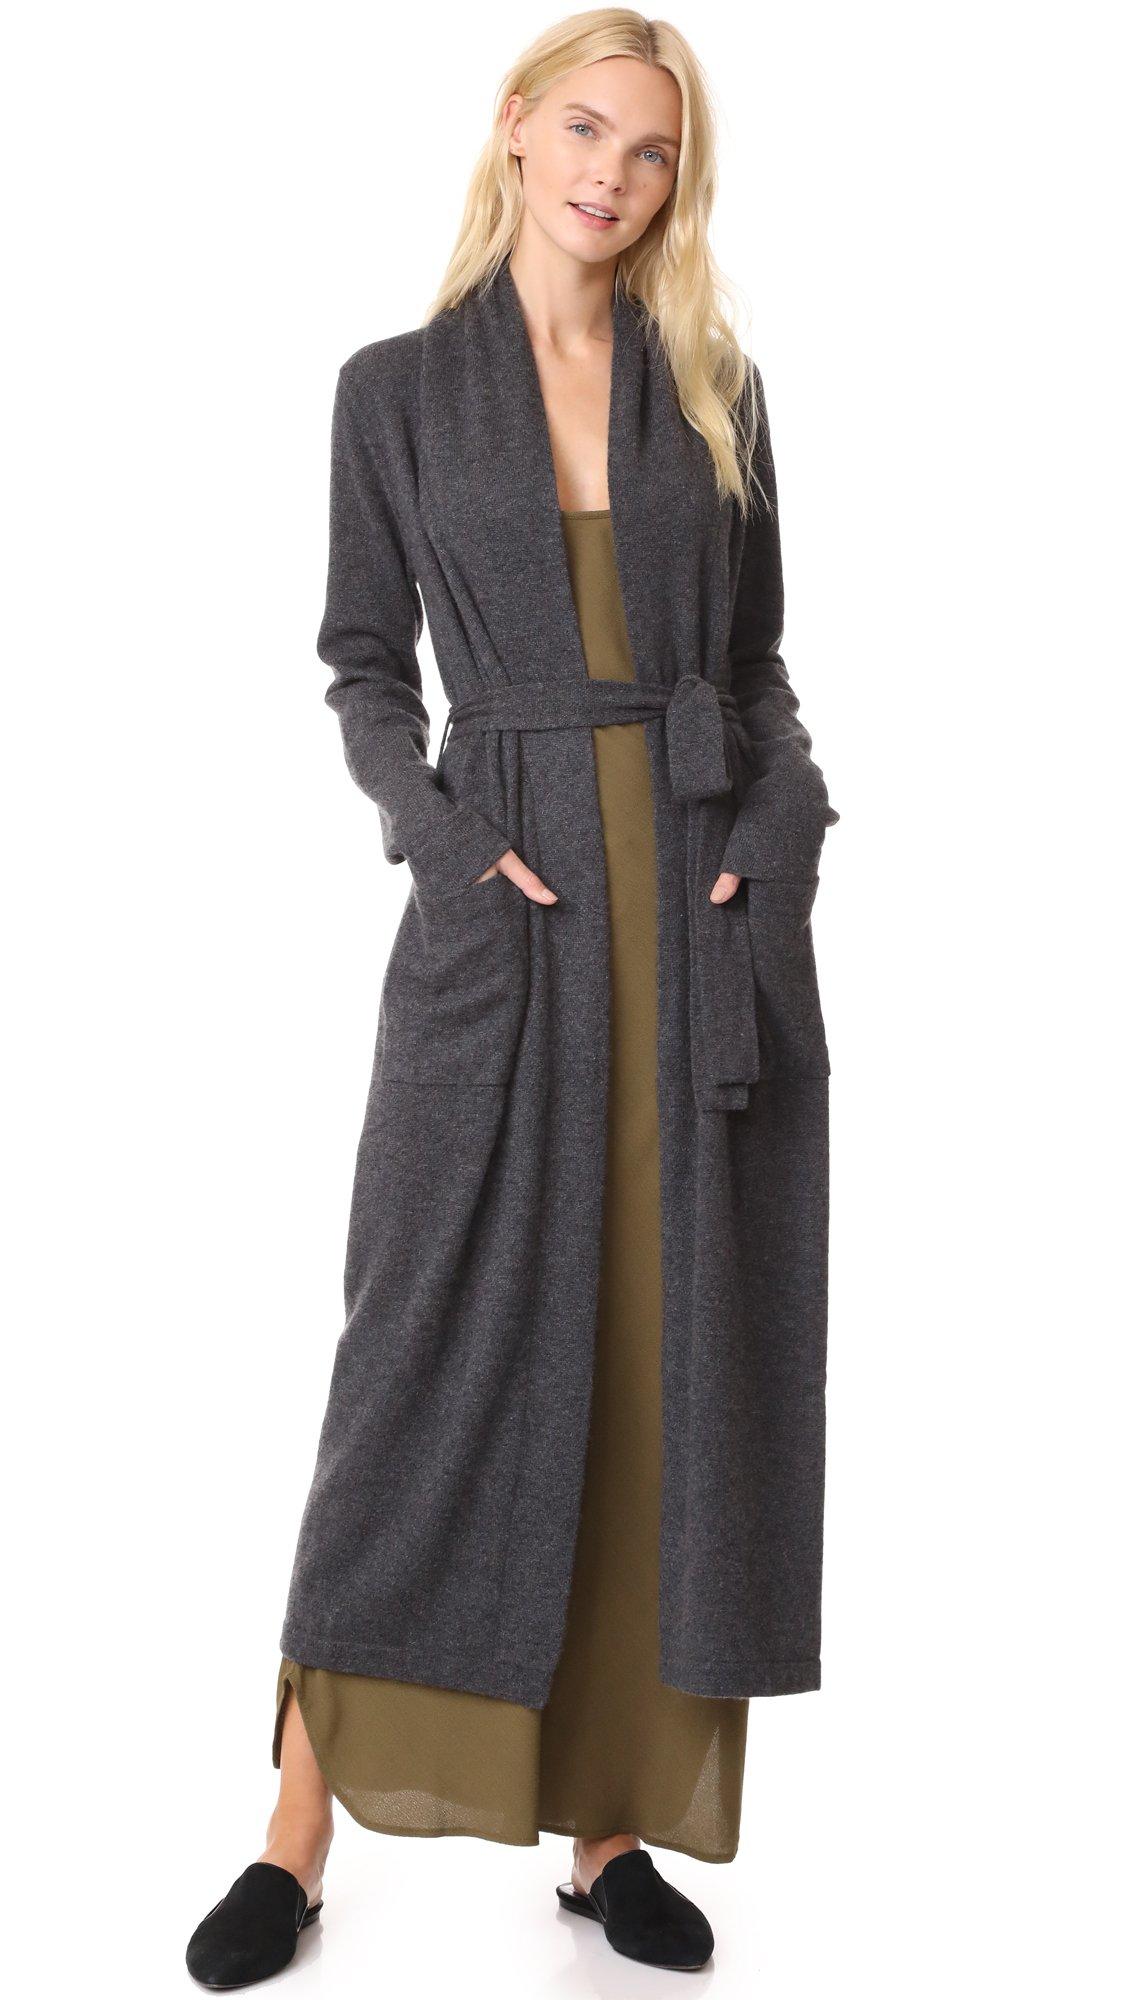 White + Warren Women's Luxe Cashmere Robe, Charcoal Heather, Medium